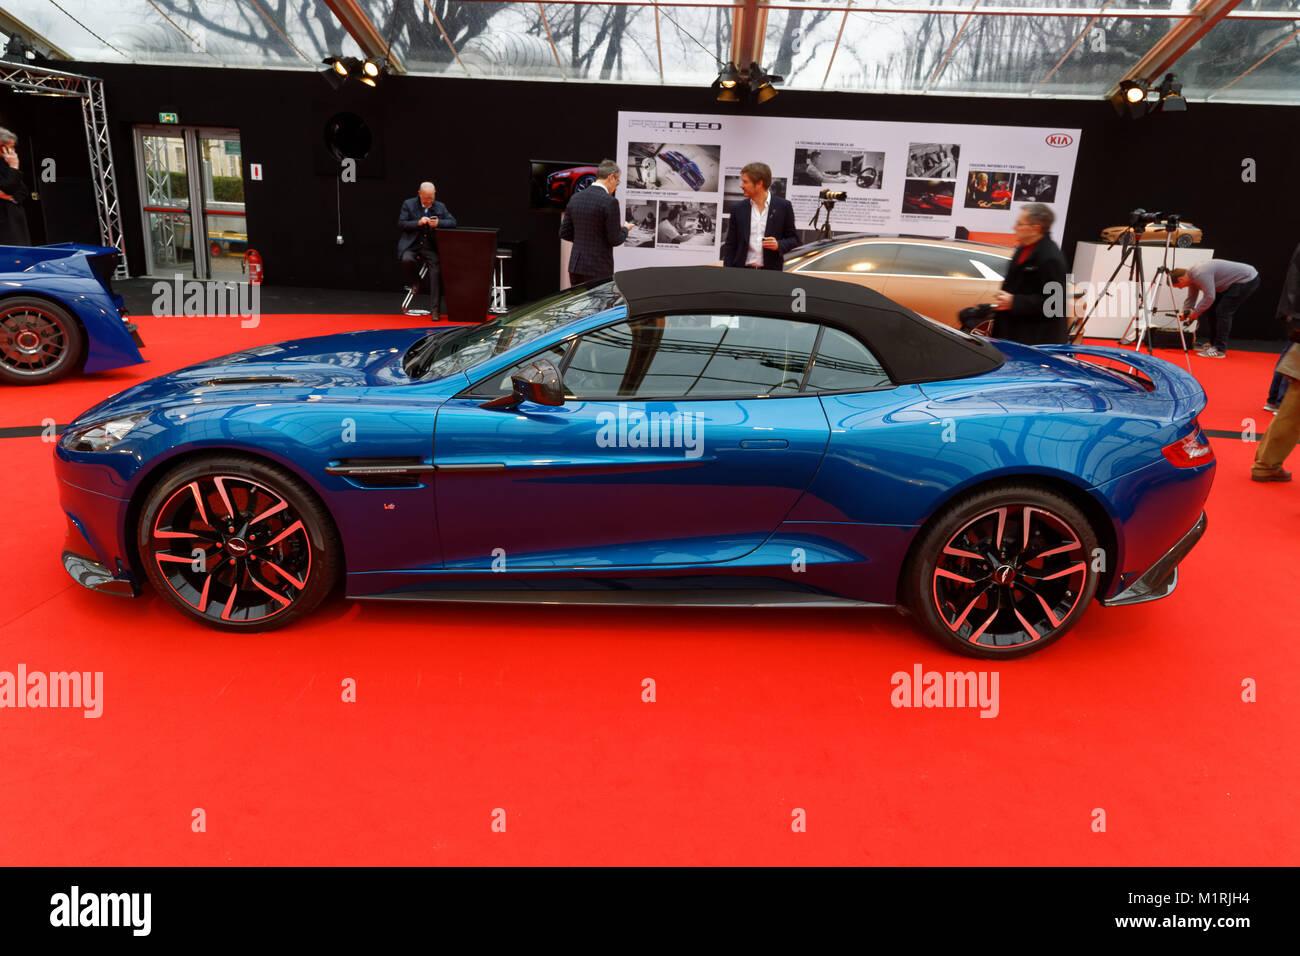 Paris, France. 31st January, 2018. ASTON MARTIN VANQUISH S - The International Automobile Festival brings together - Stock Image